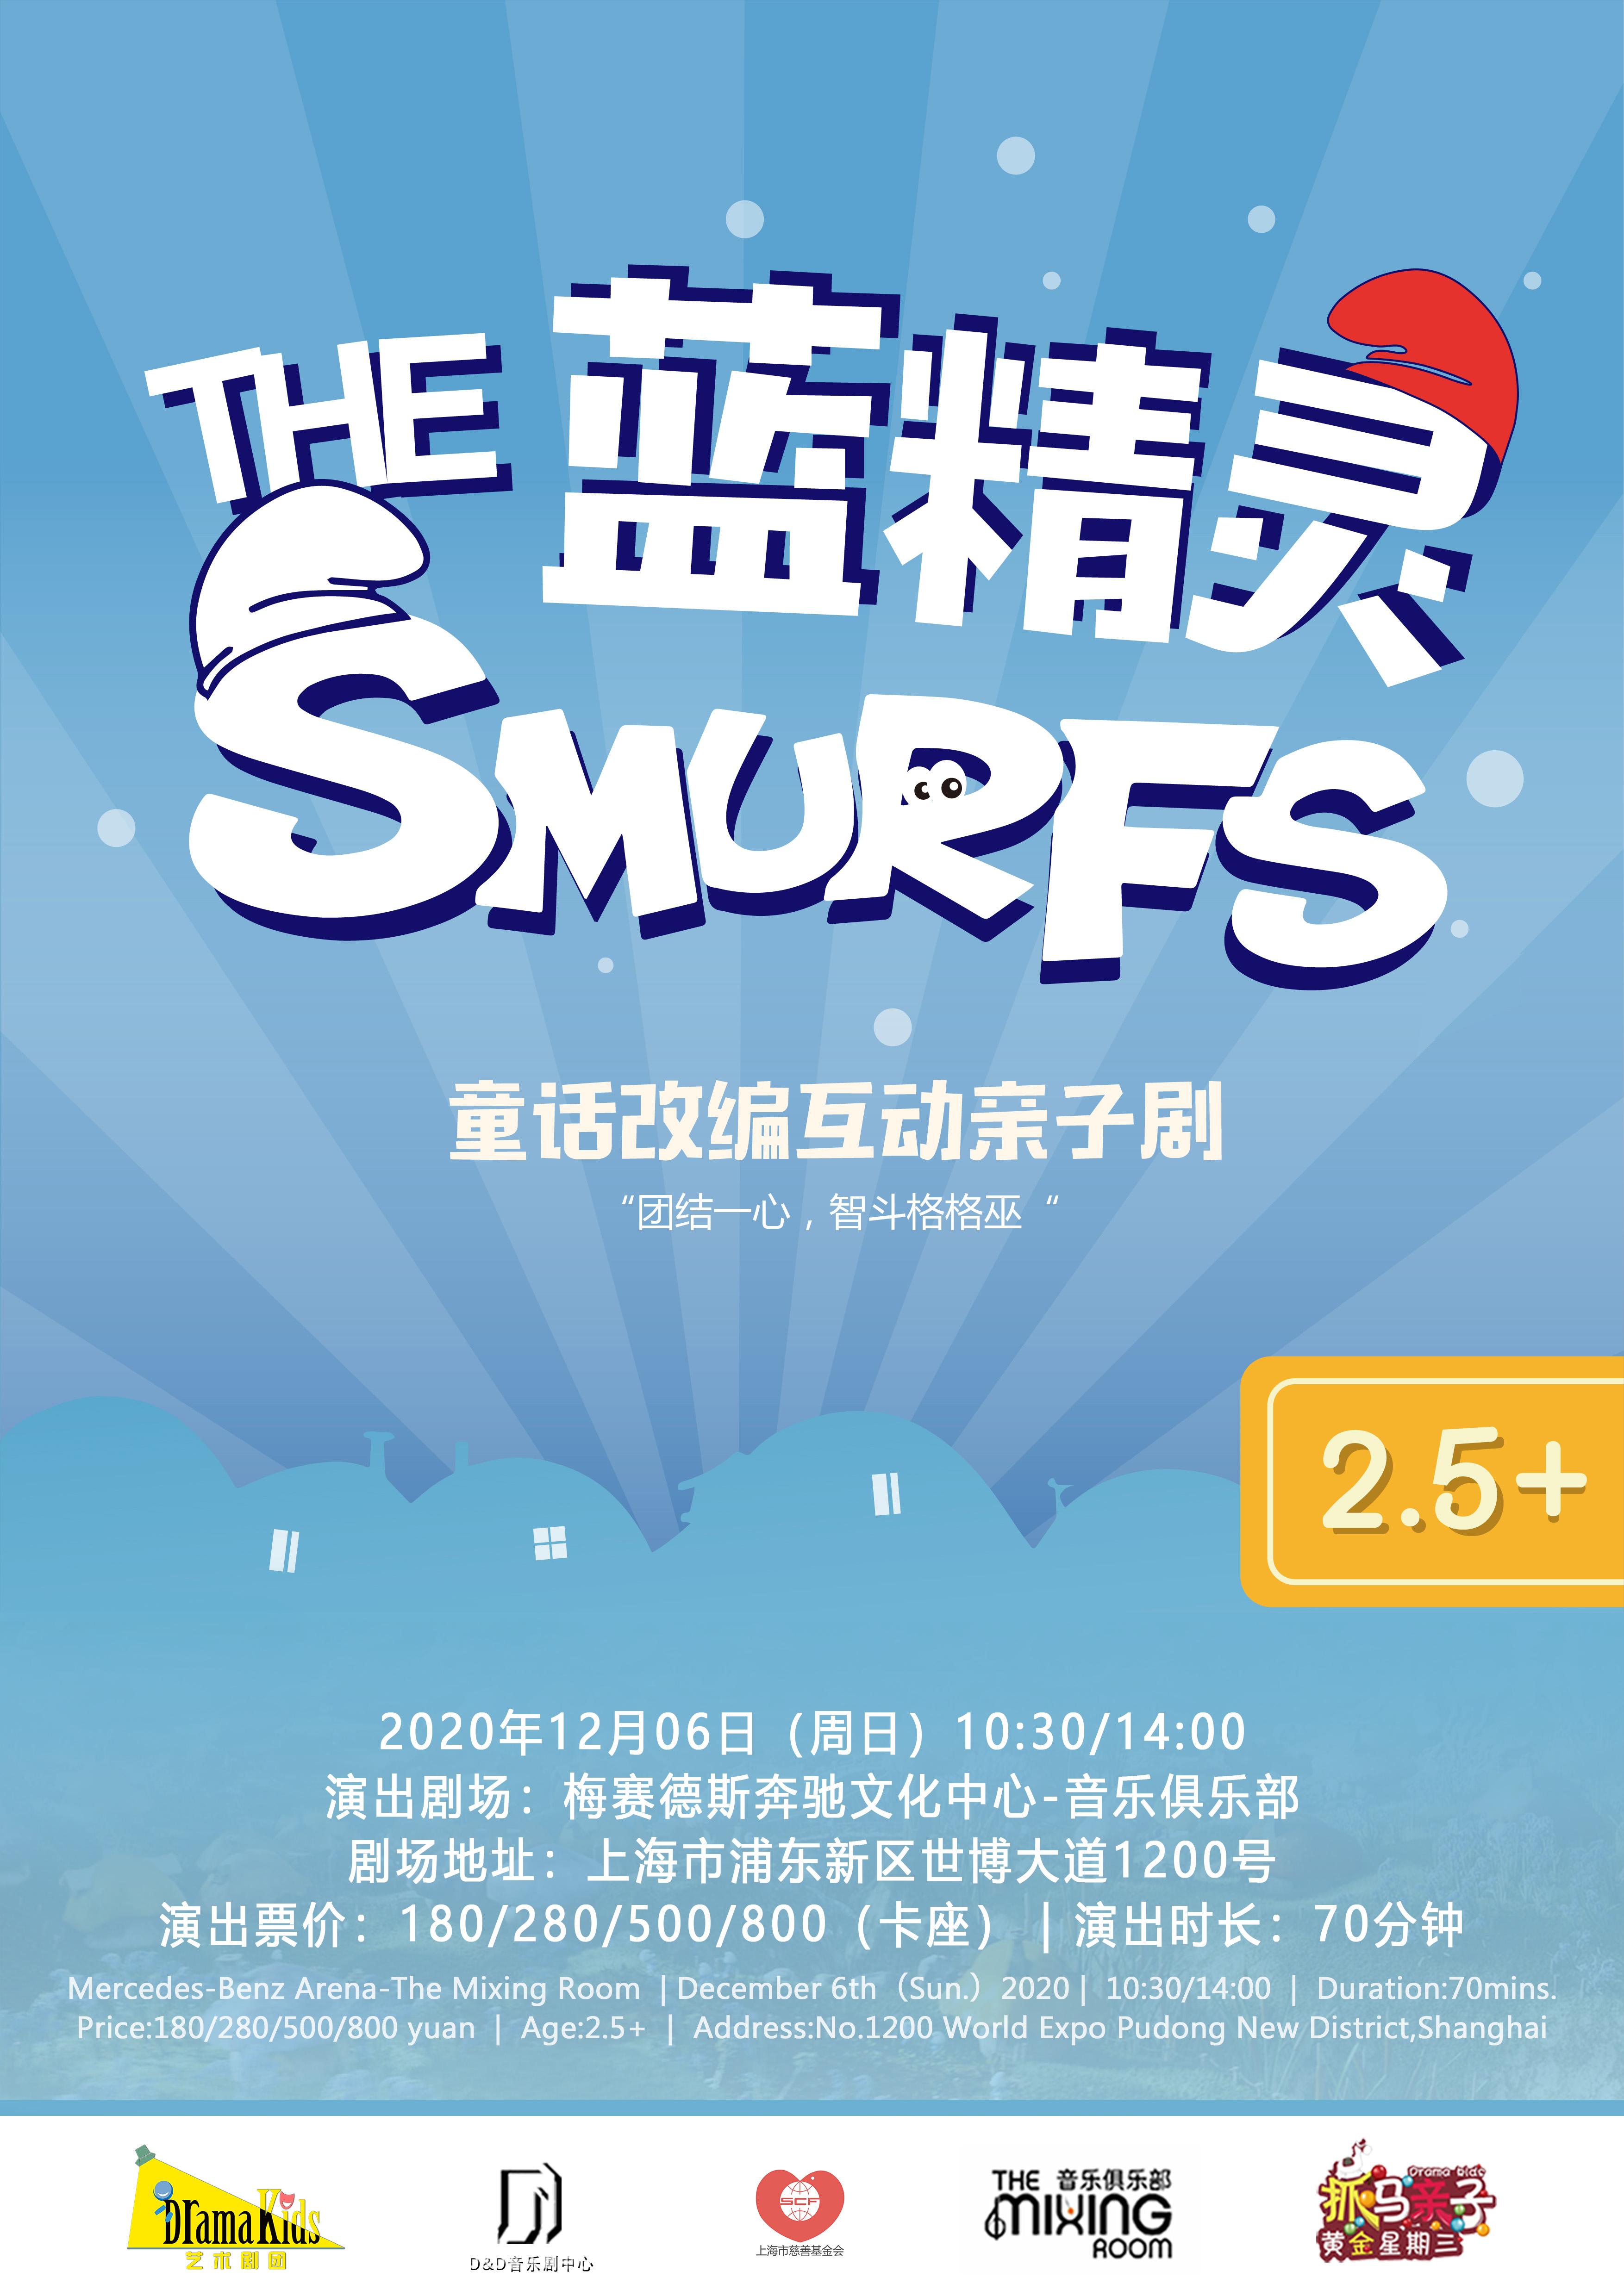 DramaKids艺术剧团·互动亲子剧《蓝精灵 The Smurfs》上海站